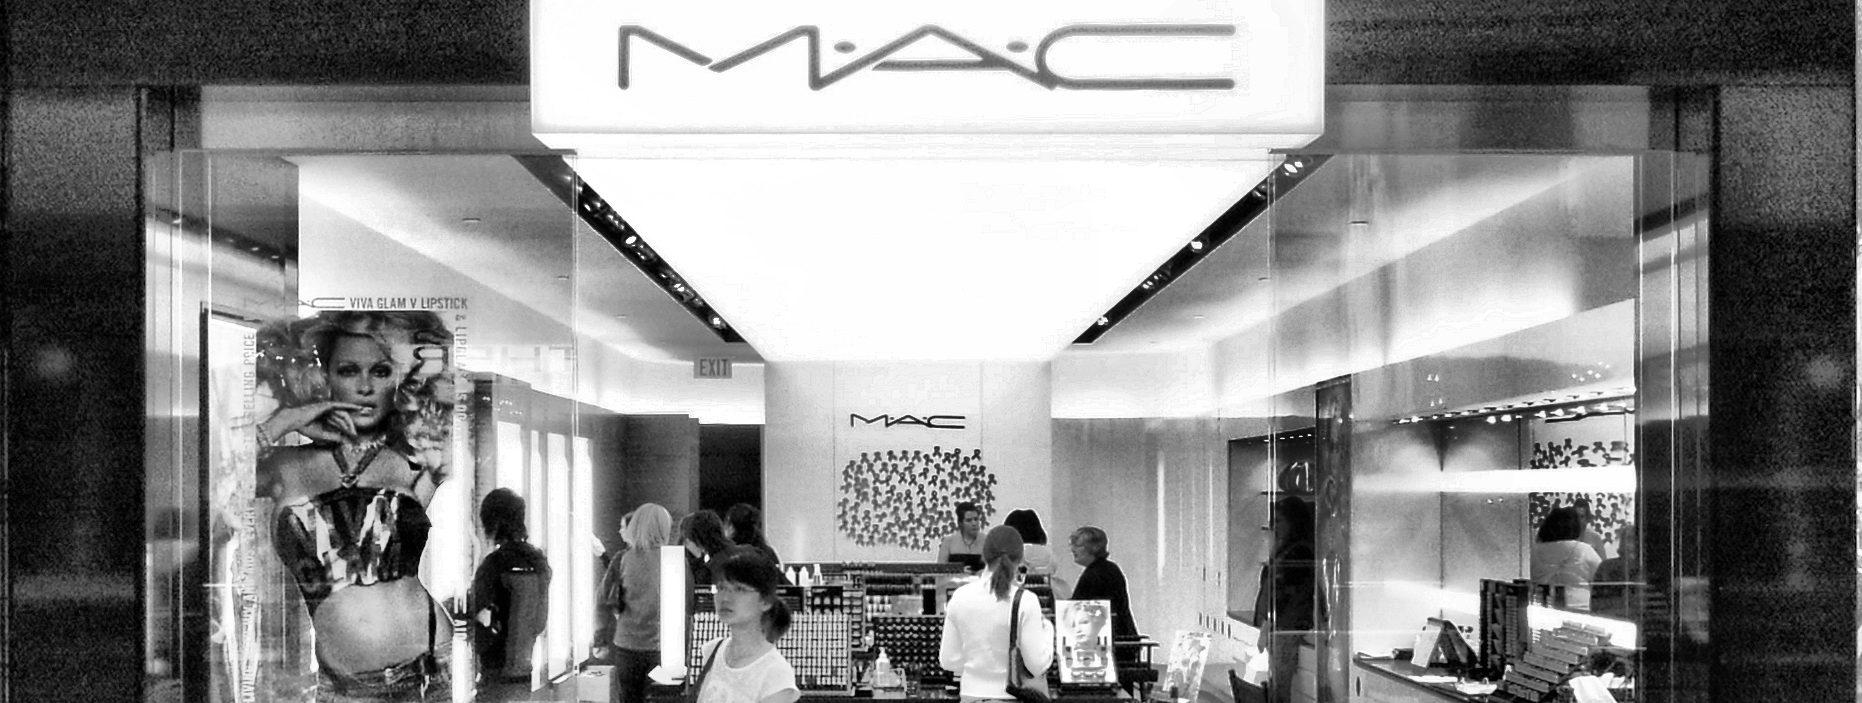 working at mac cosmetics